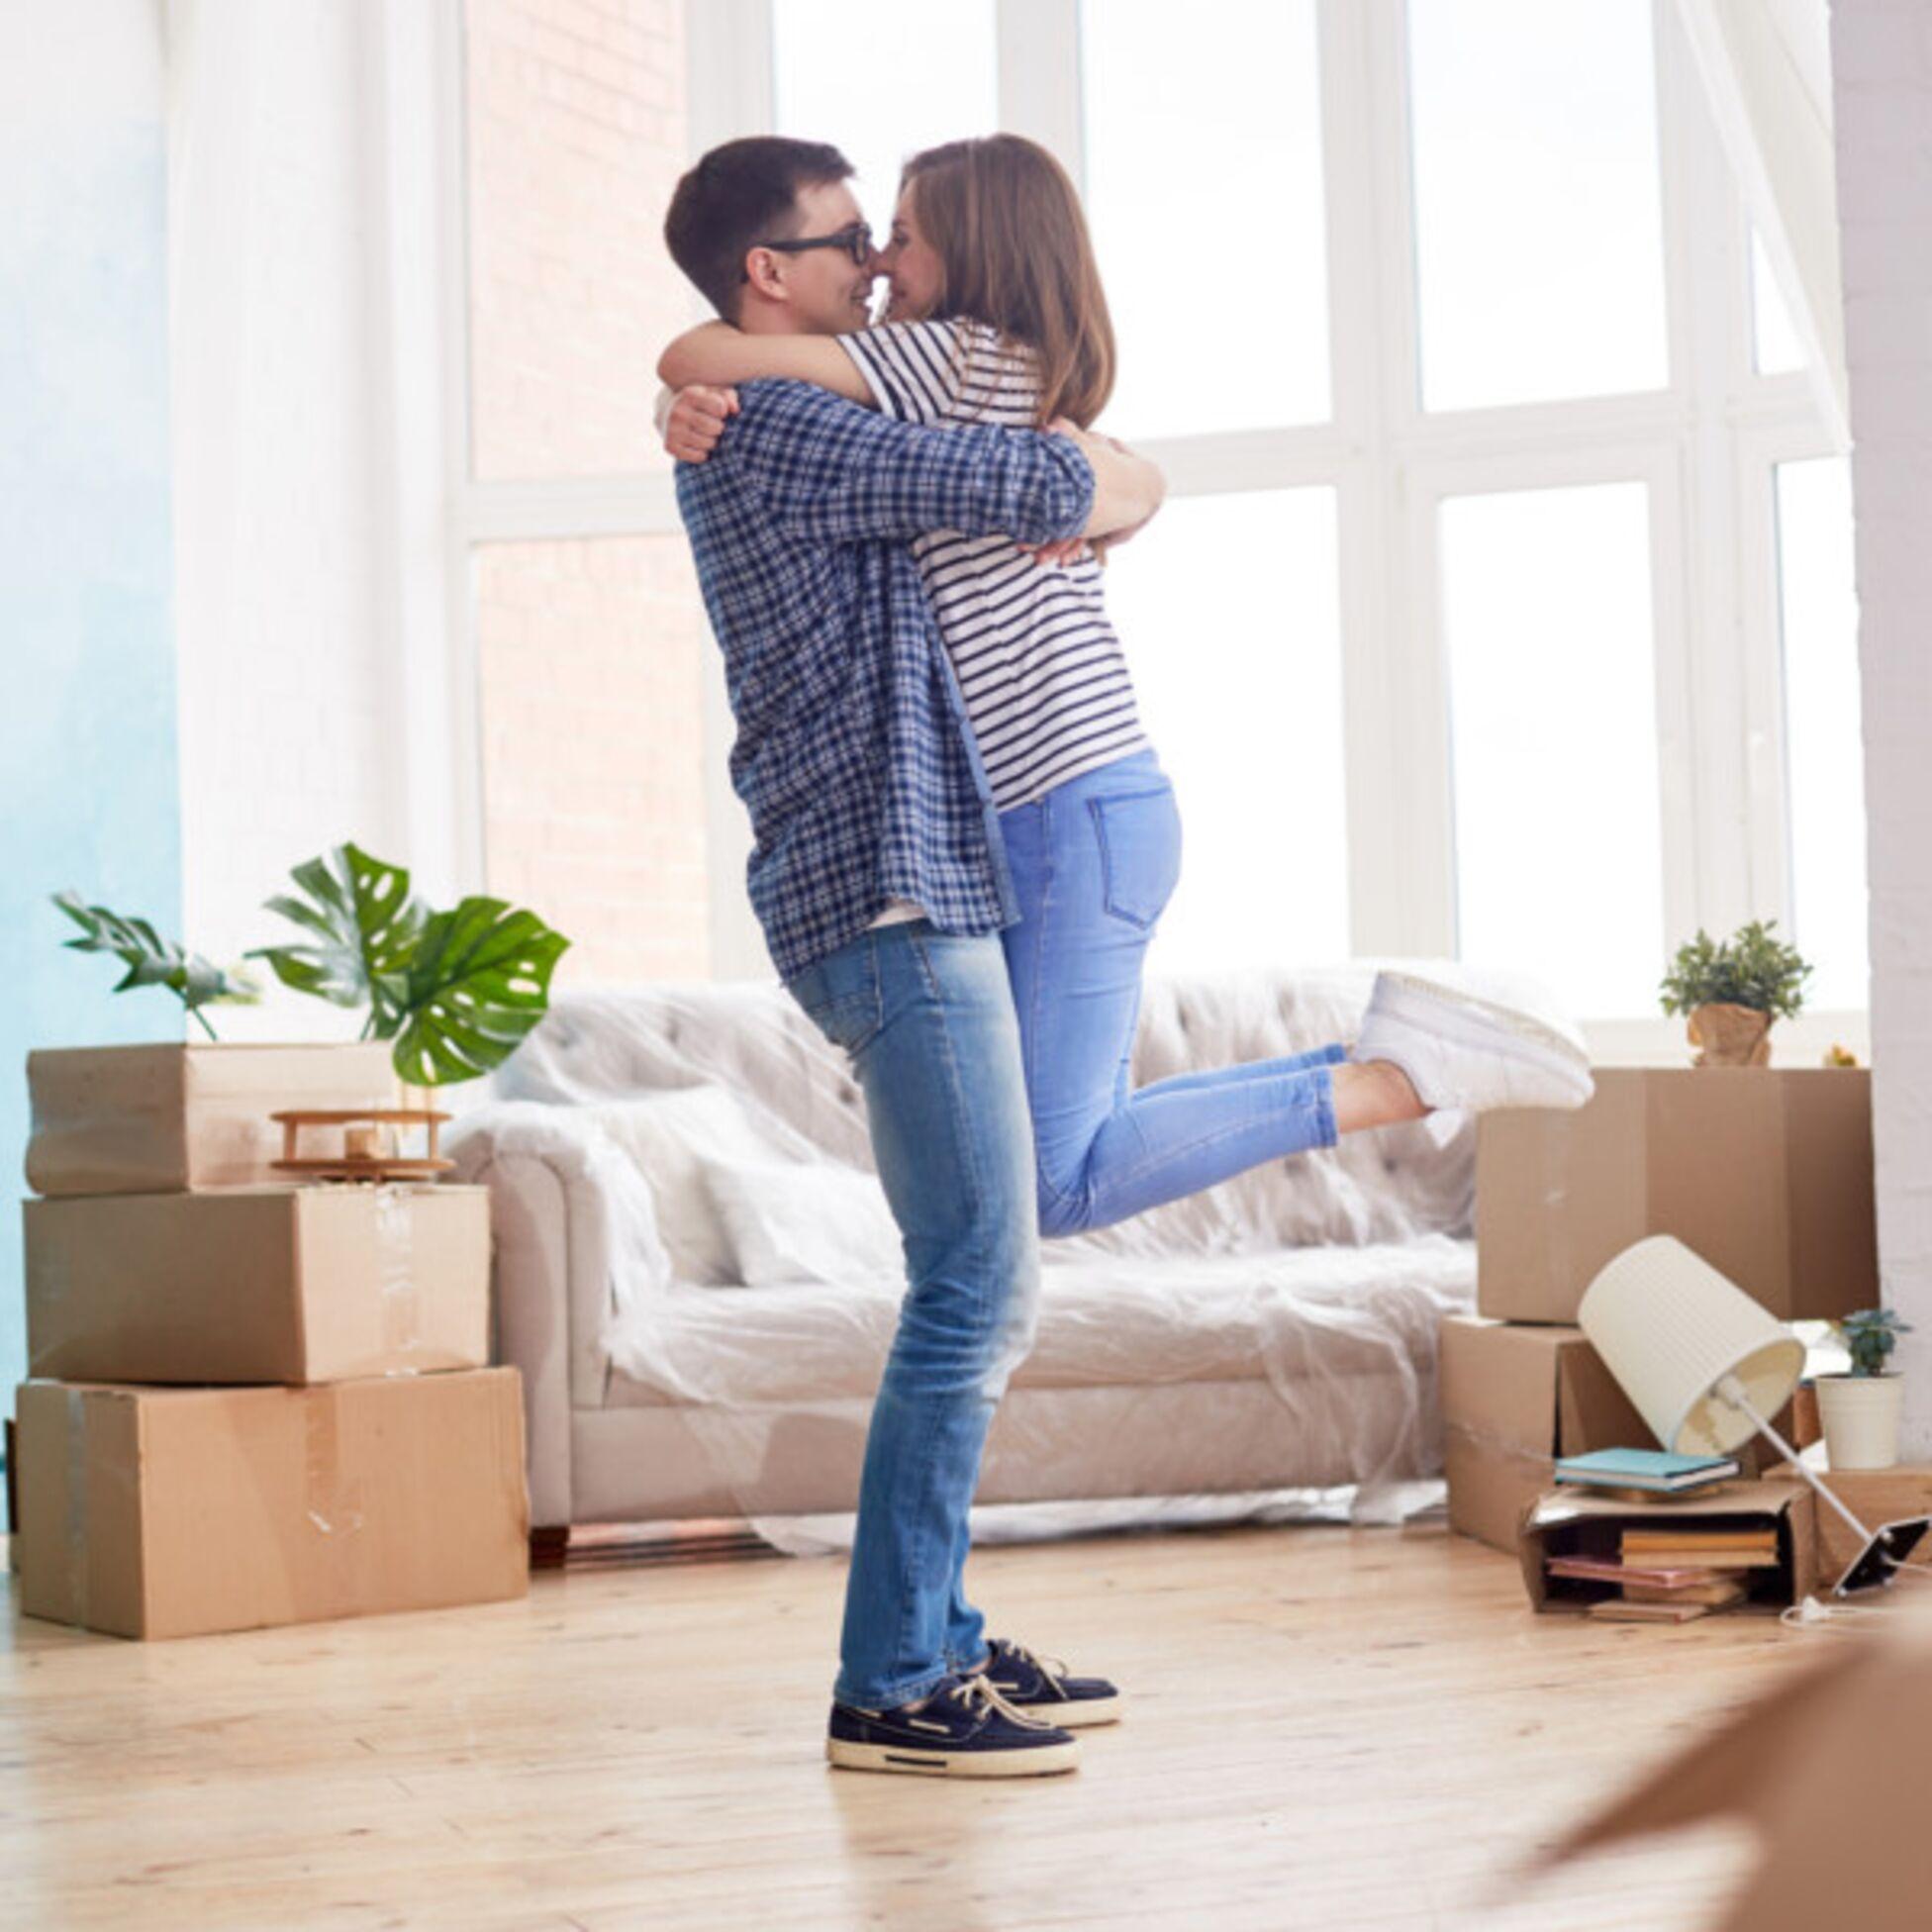 Junges Paar umarmt sich zwischen Umzugskartons